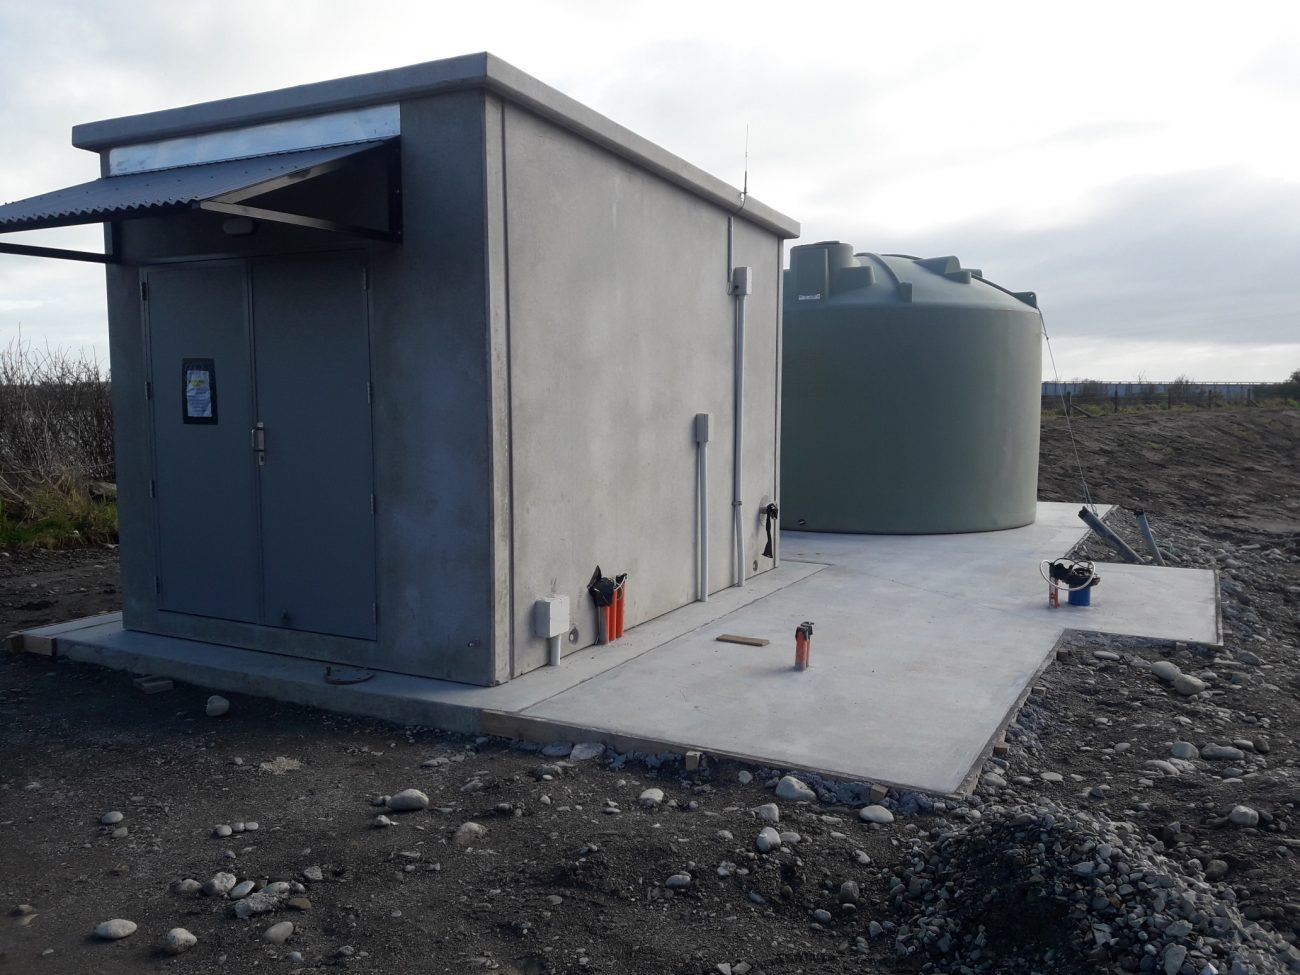 Mayor's update on the Arahura Water Treatment Plant